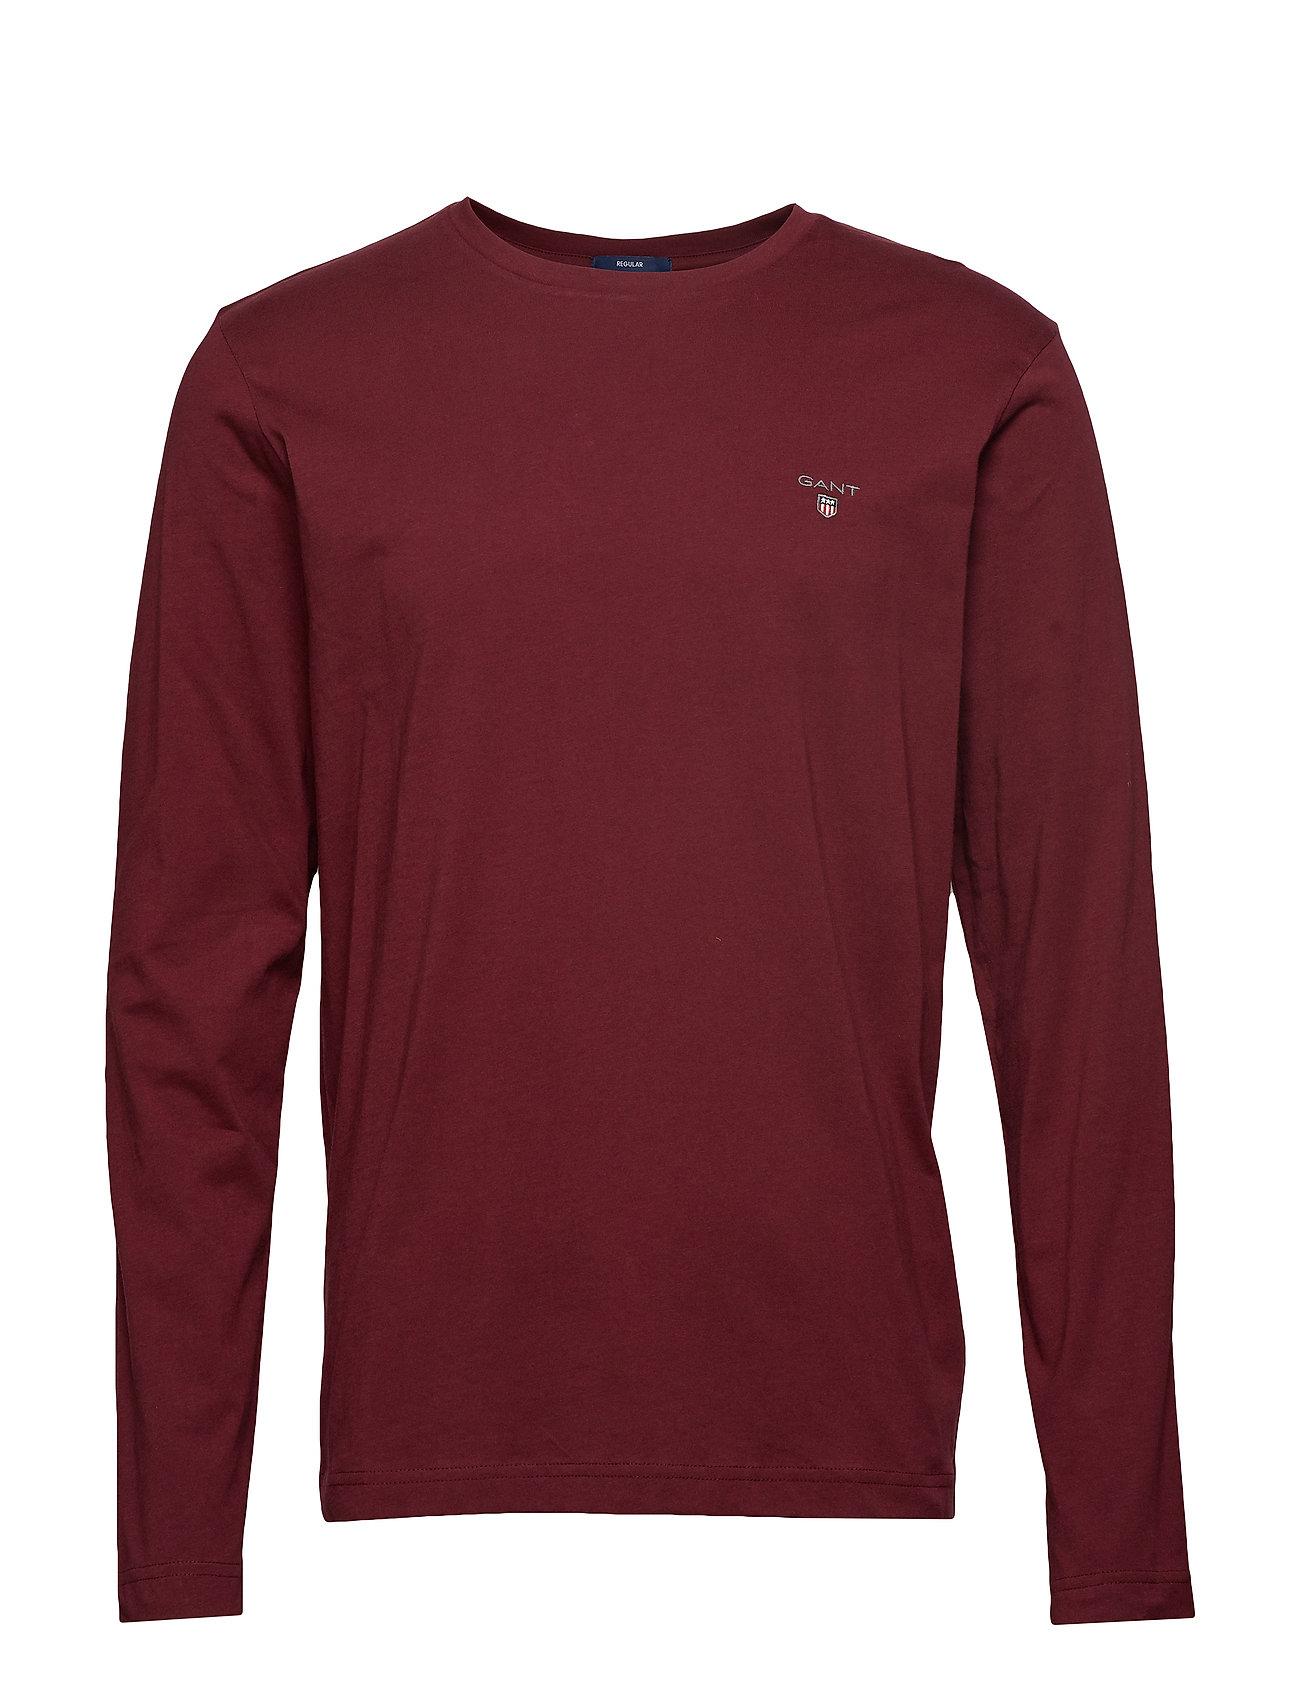 T Original RedGant The Ls shirtport 8OnXwPkN0